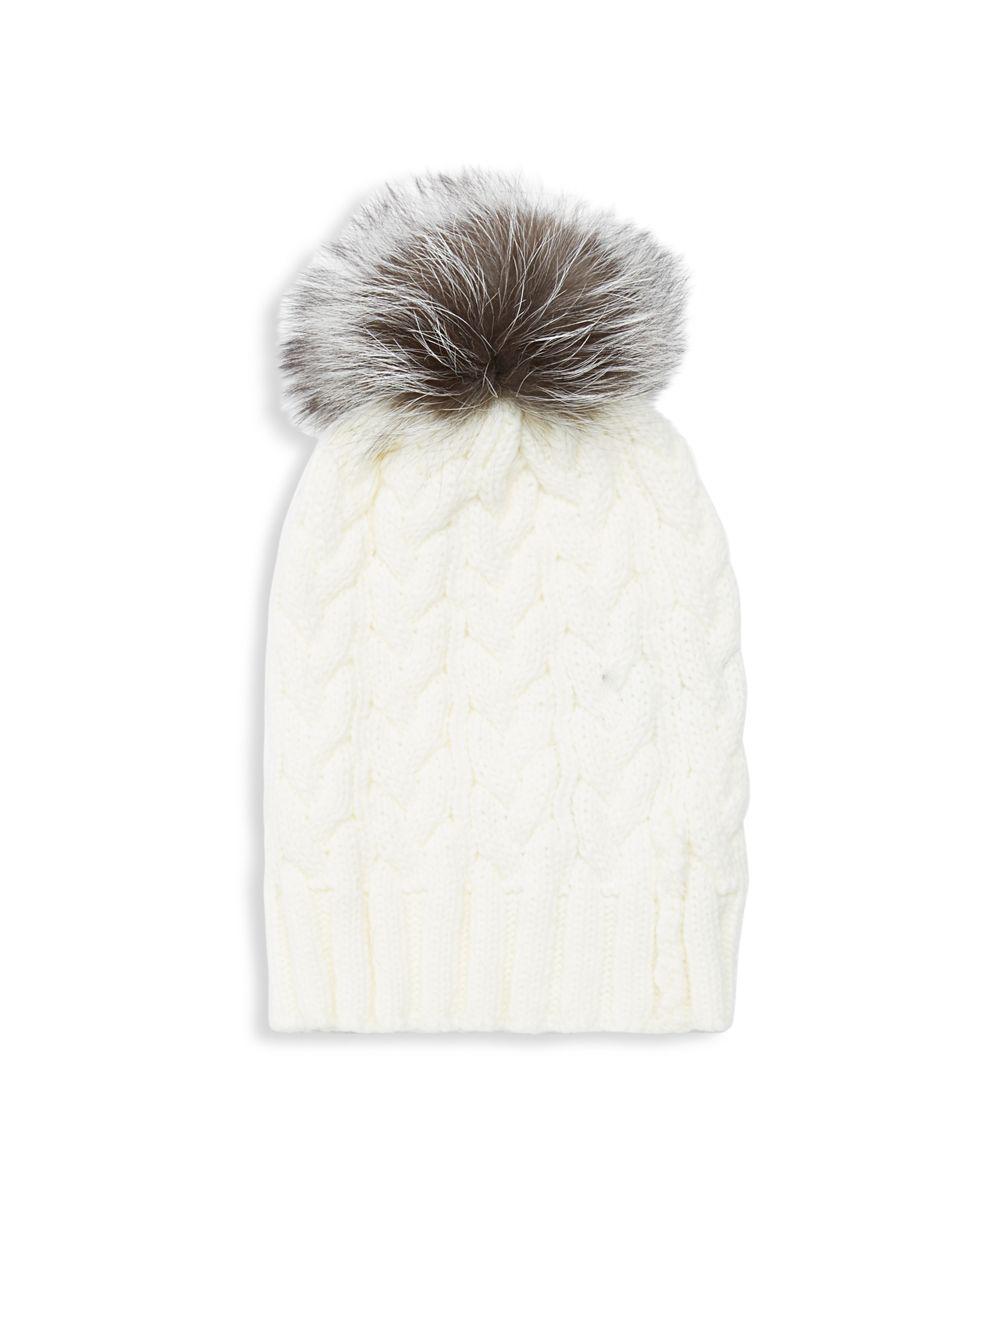 4e6cc035ade Lyst - Adrienne Landau Natural Fox Fur Pom Pom Hat in White